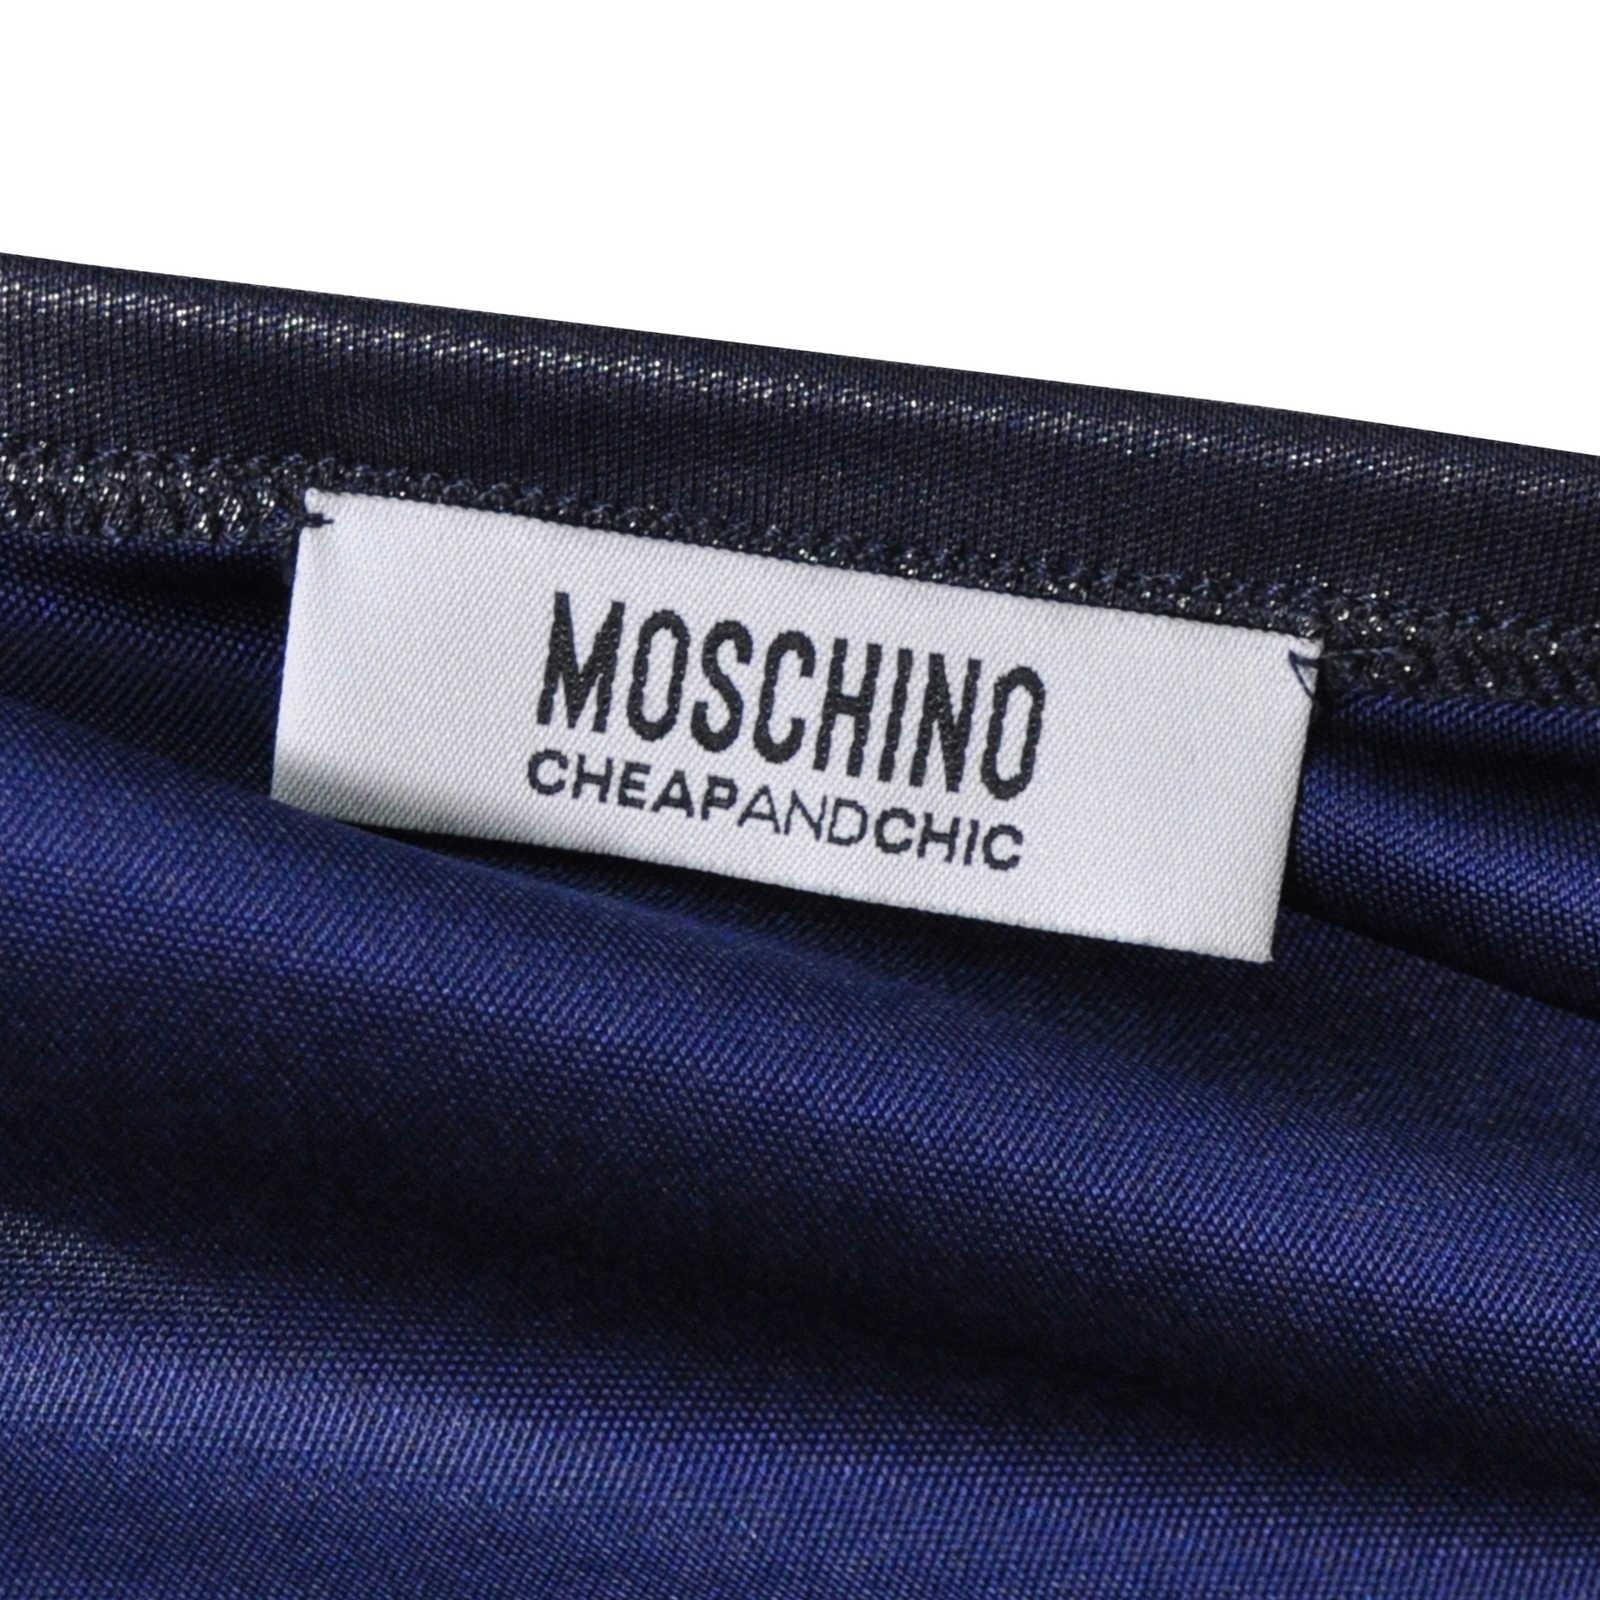 c623e7a09e68 ... 1 Authentic Second Hand Moschino Metallic Dress (PSS-200-00428) -  Thumbnail 2